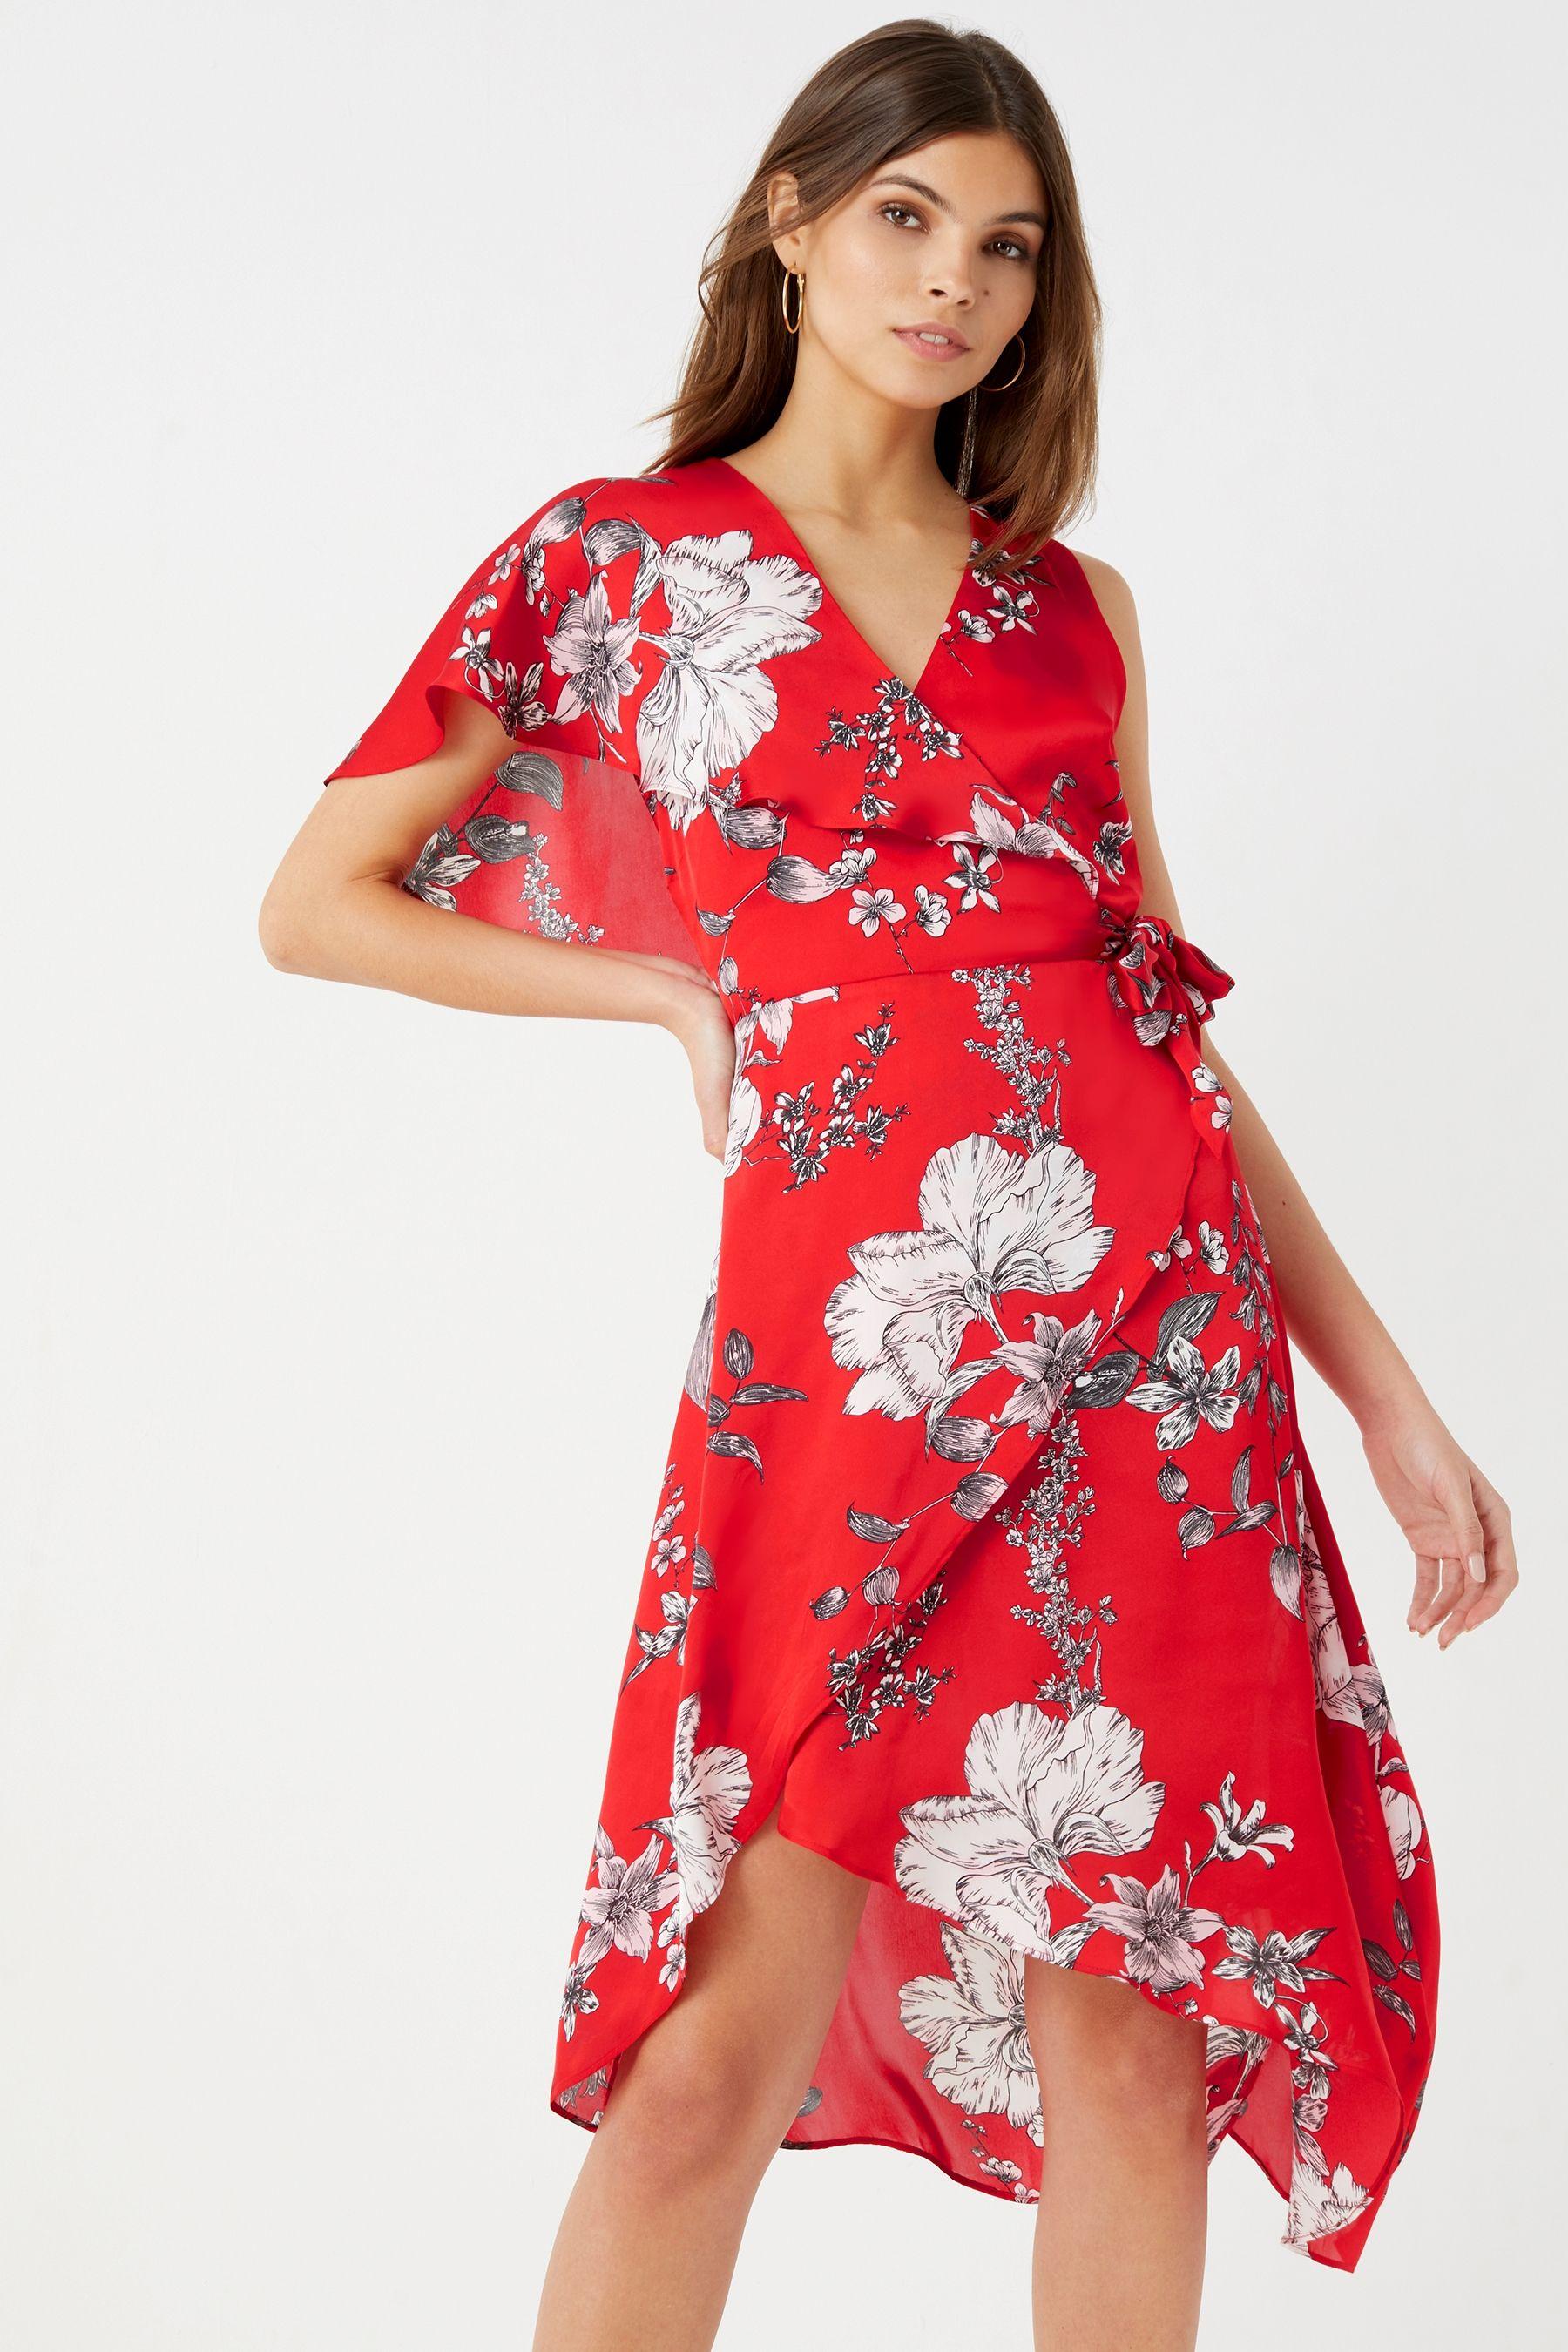 67920fc0d5 Lipsy Floral Print Burnout Maxi Dress Uk